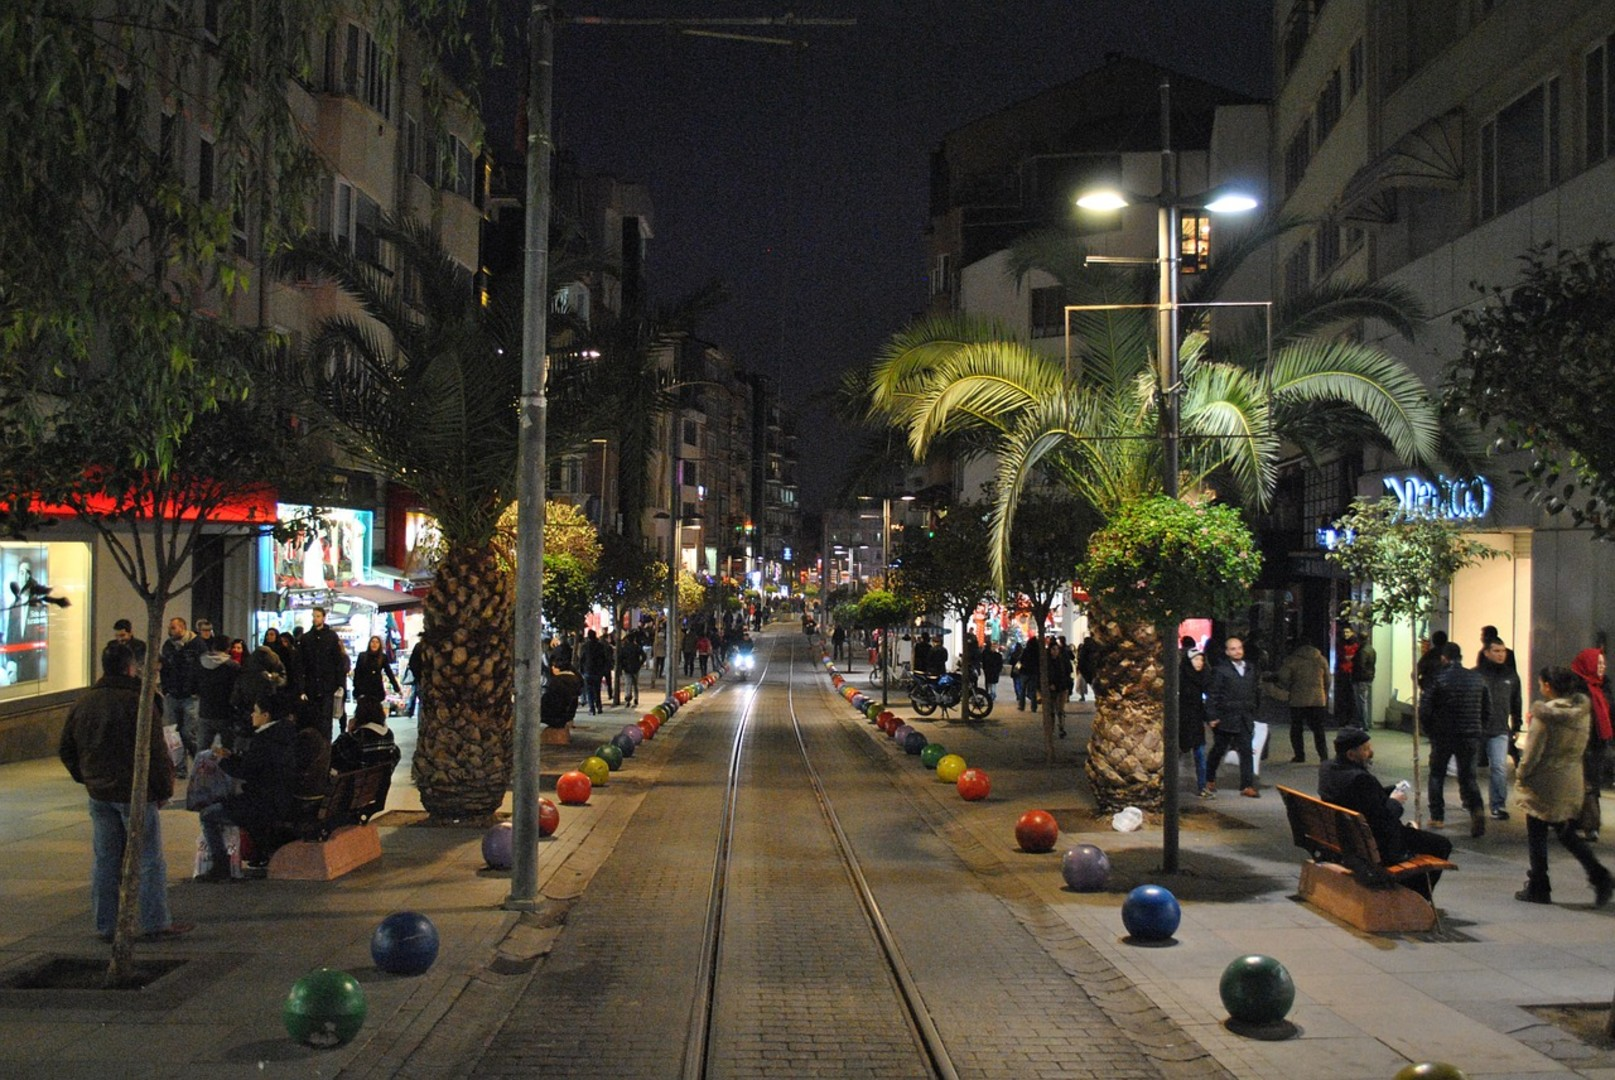 istanbul-989974_1280.jpg